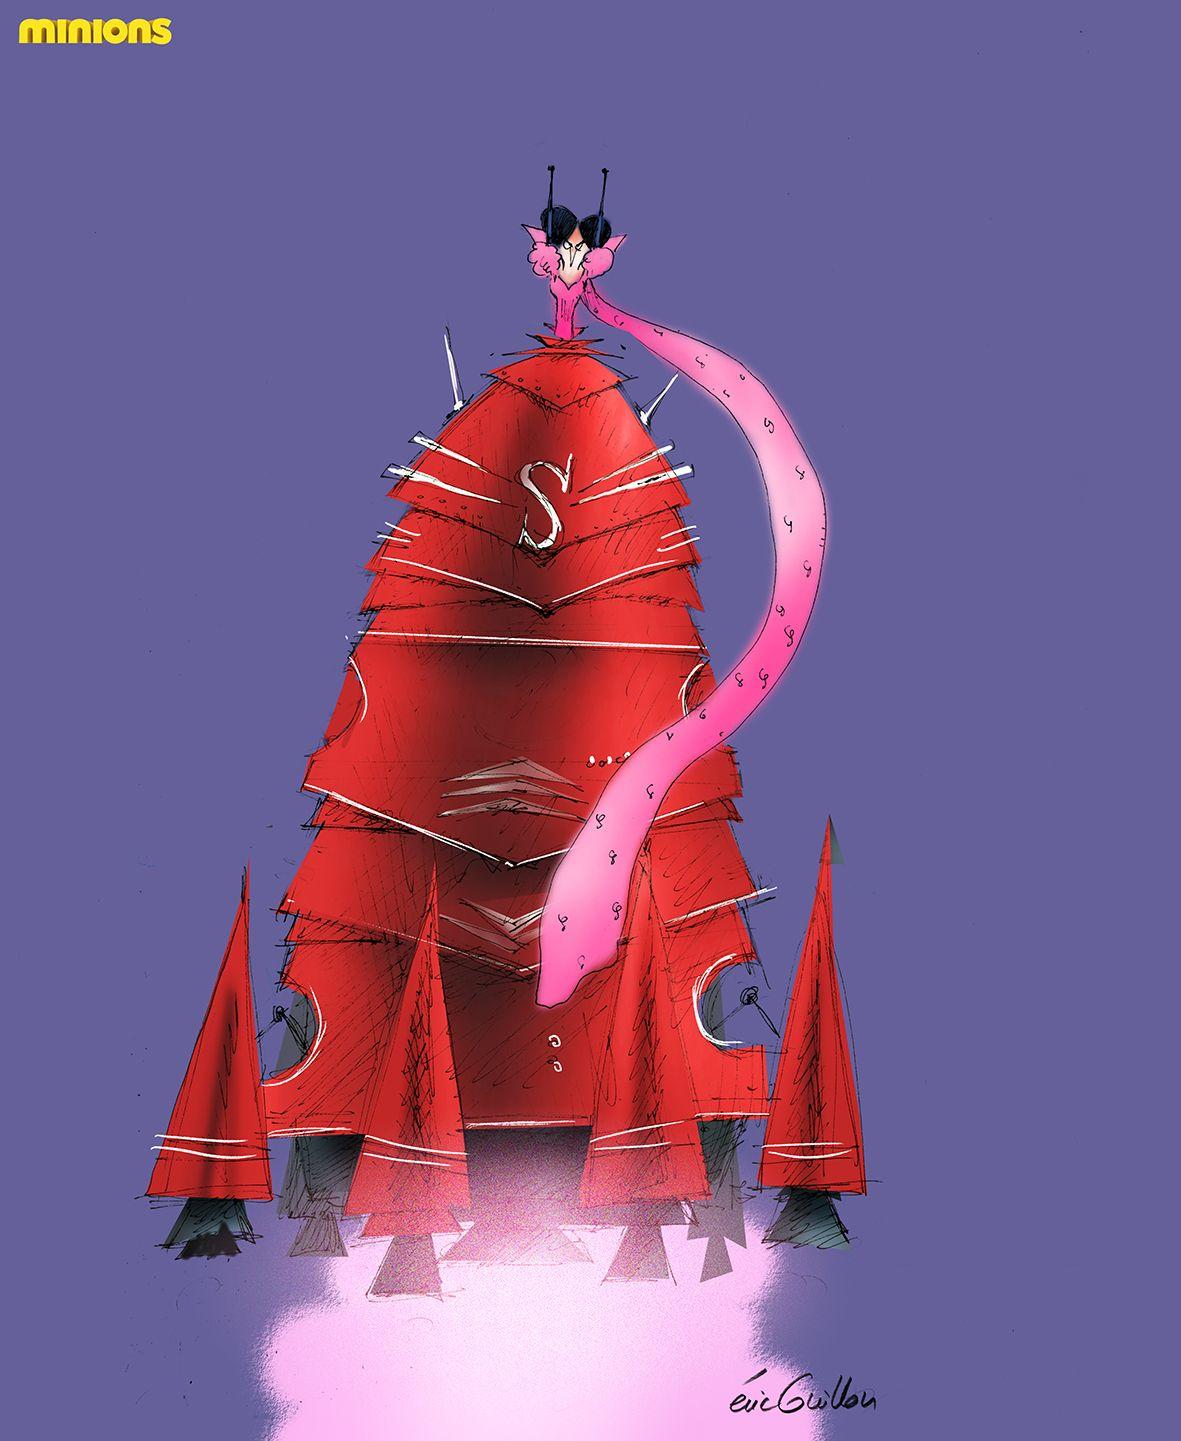 eric guillon: Scarlet Overkill. Rocket dress